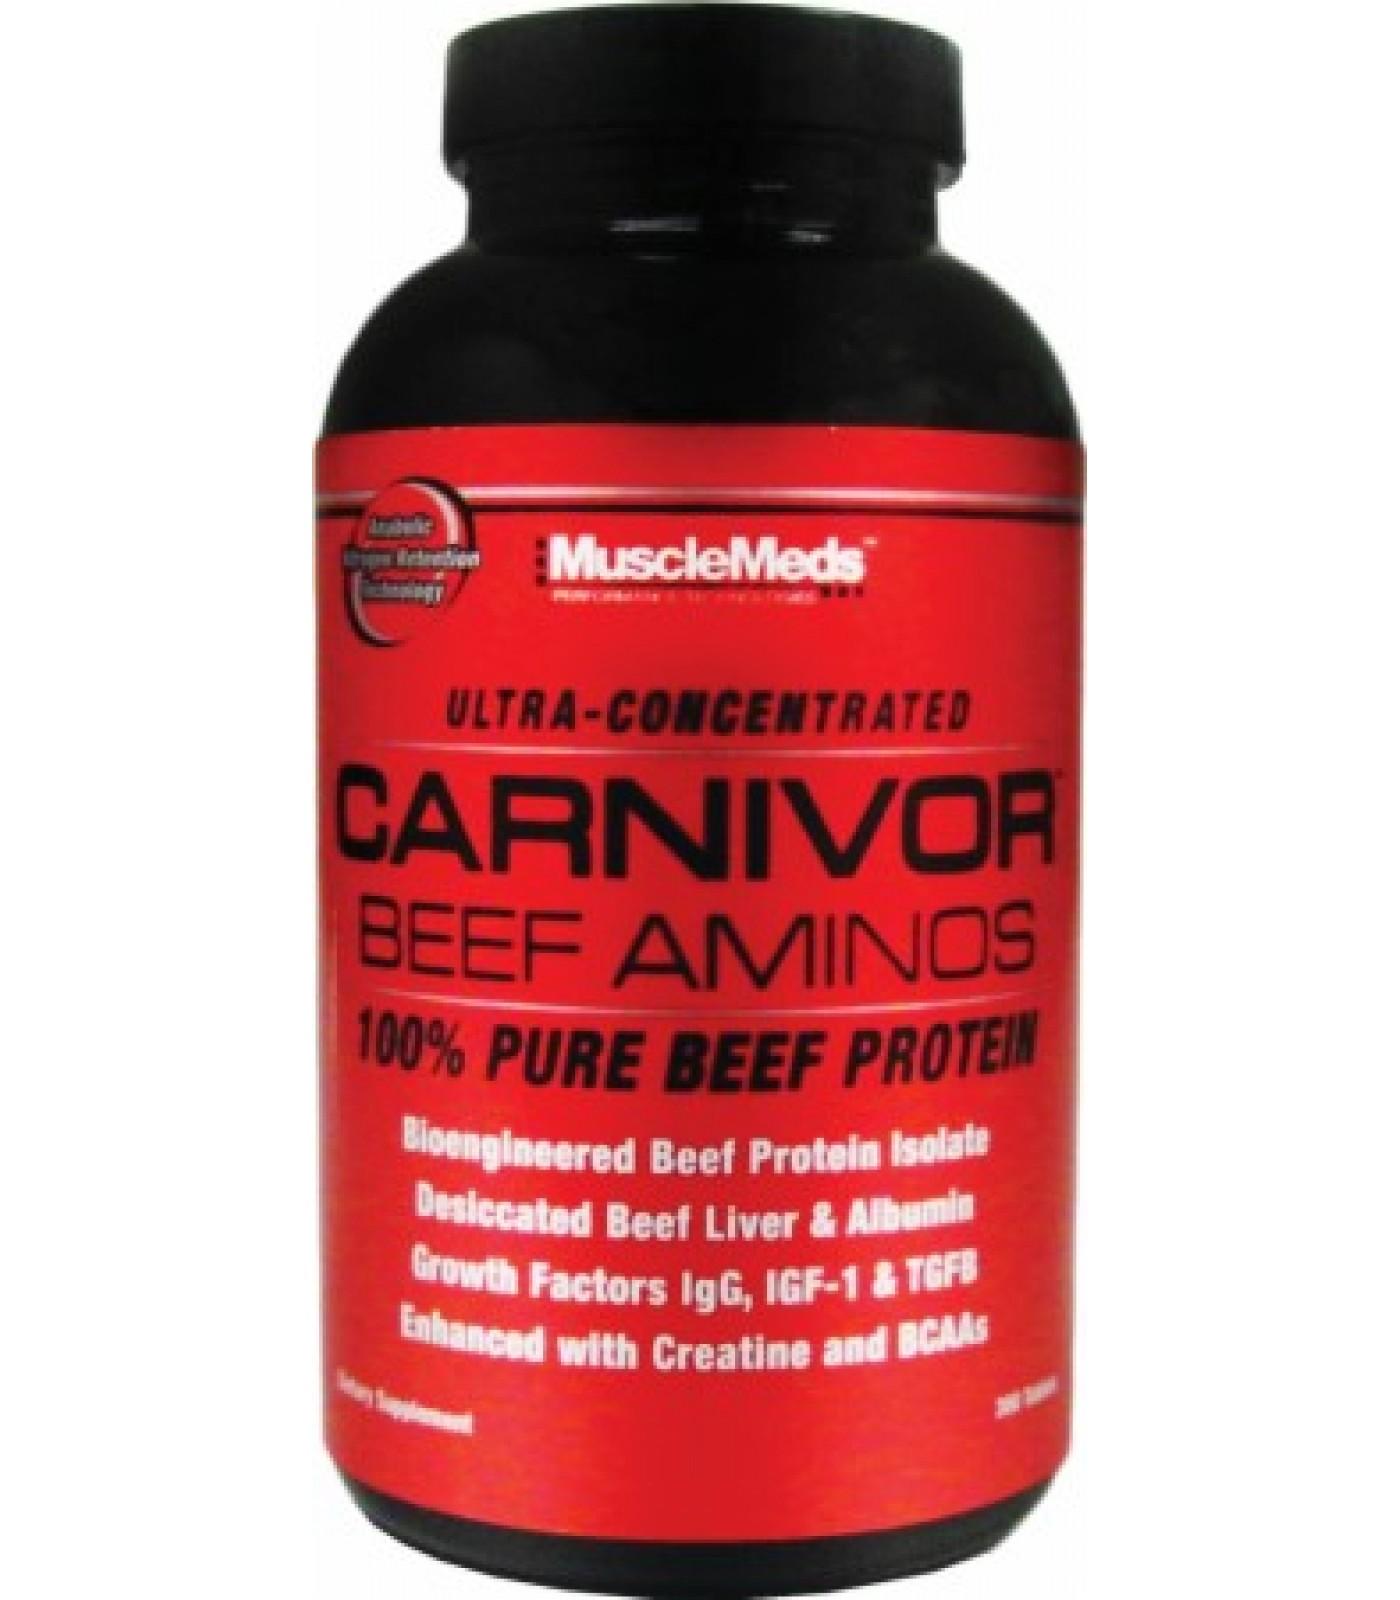 MuscleMeds - Carnivor Beef Aminos / 300 tabs.